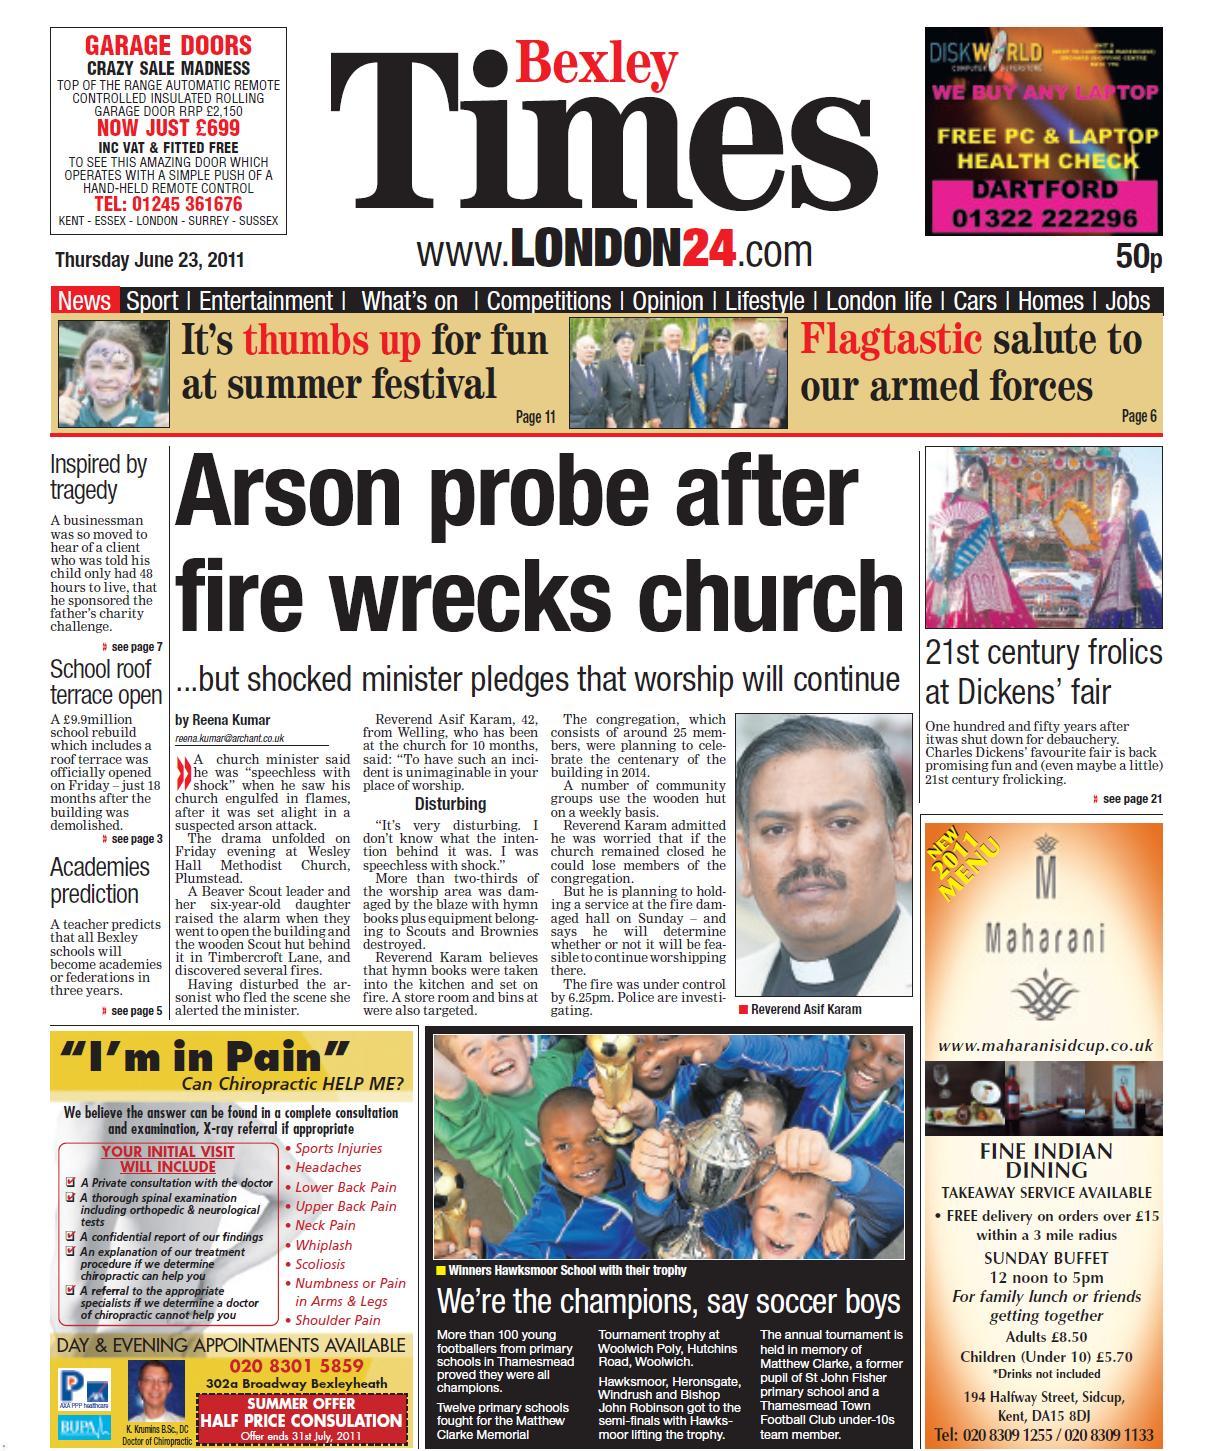 TIMES LONDON24  23 29 JUNE 2011